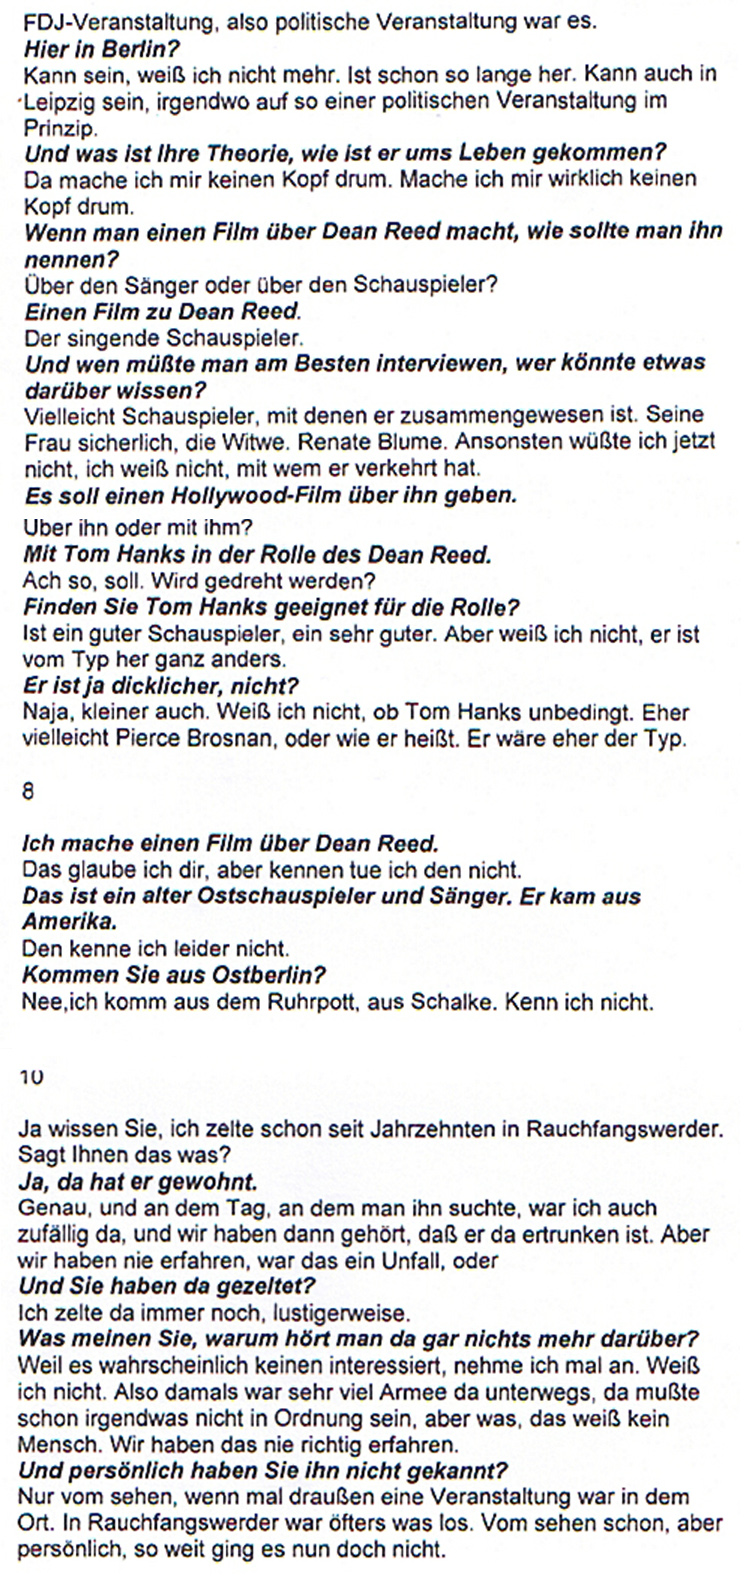 strasseninterviews-4.jpg